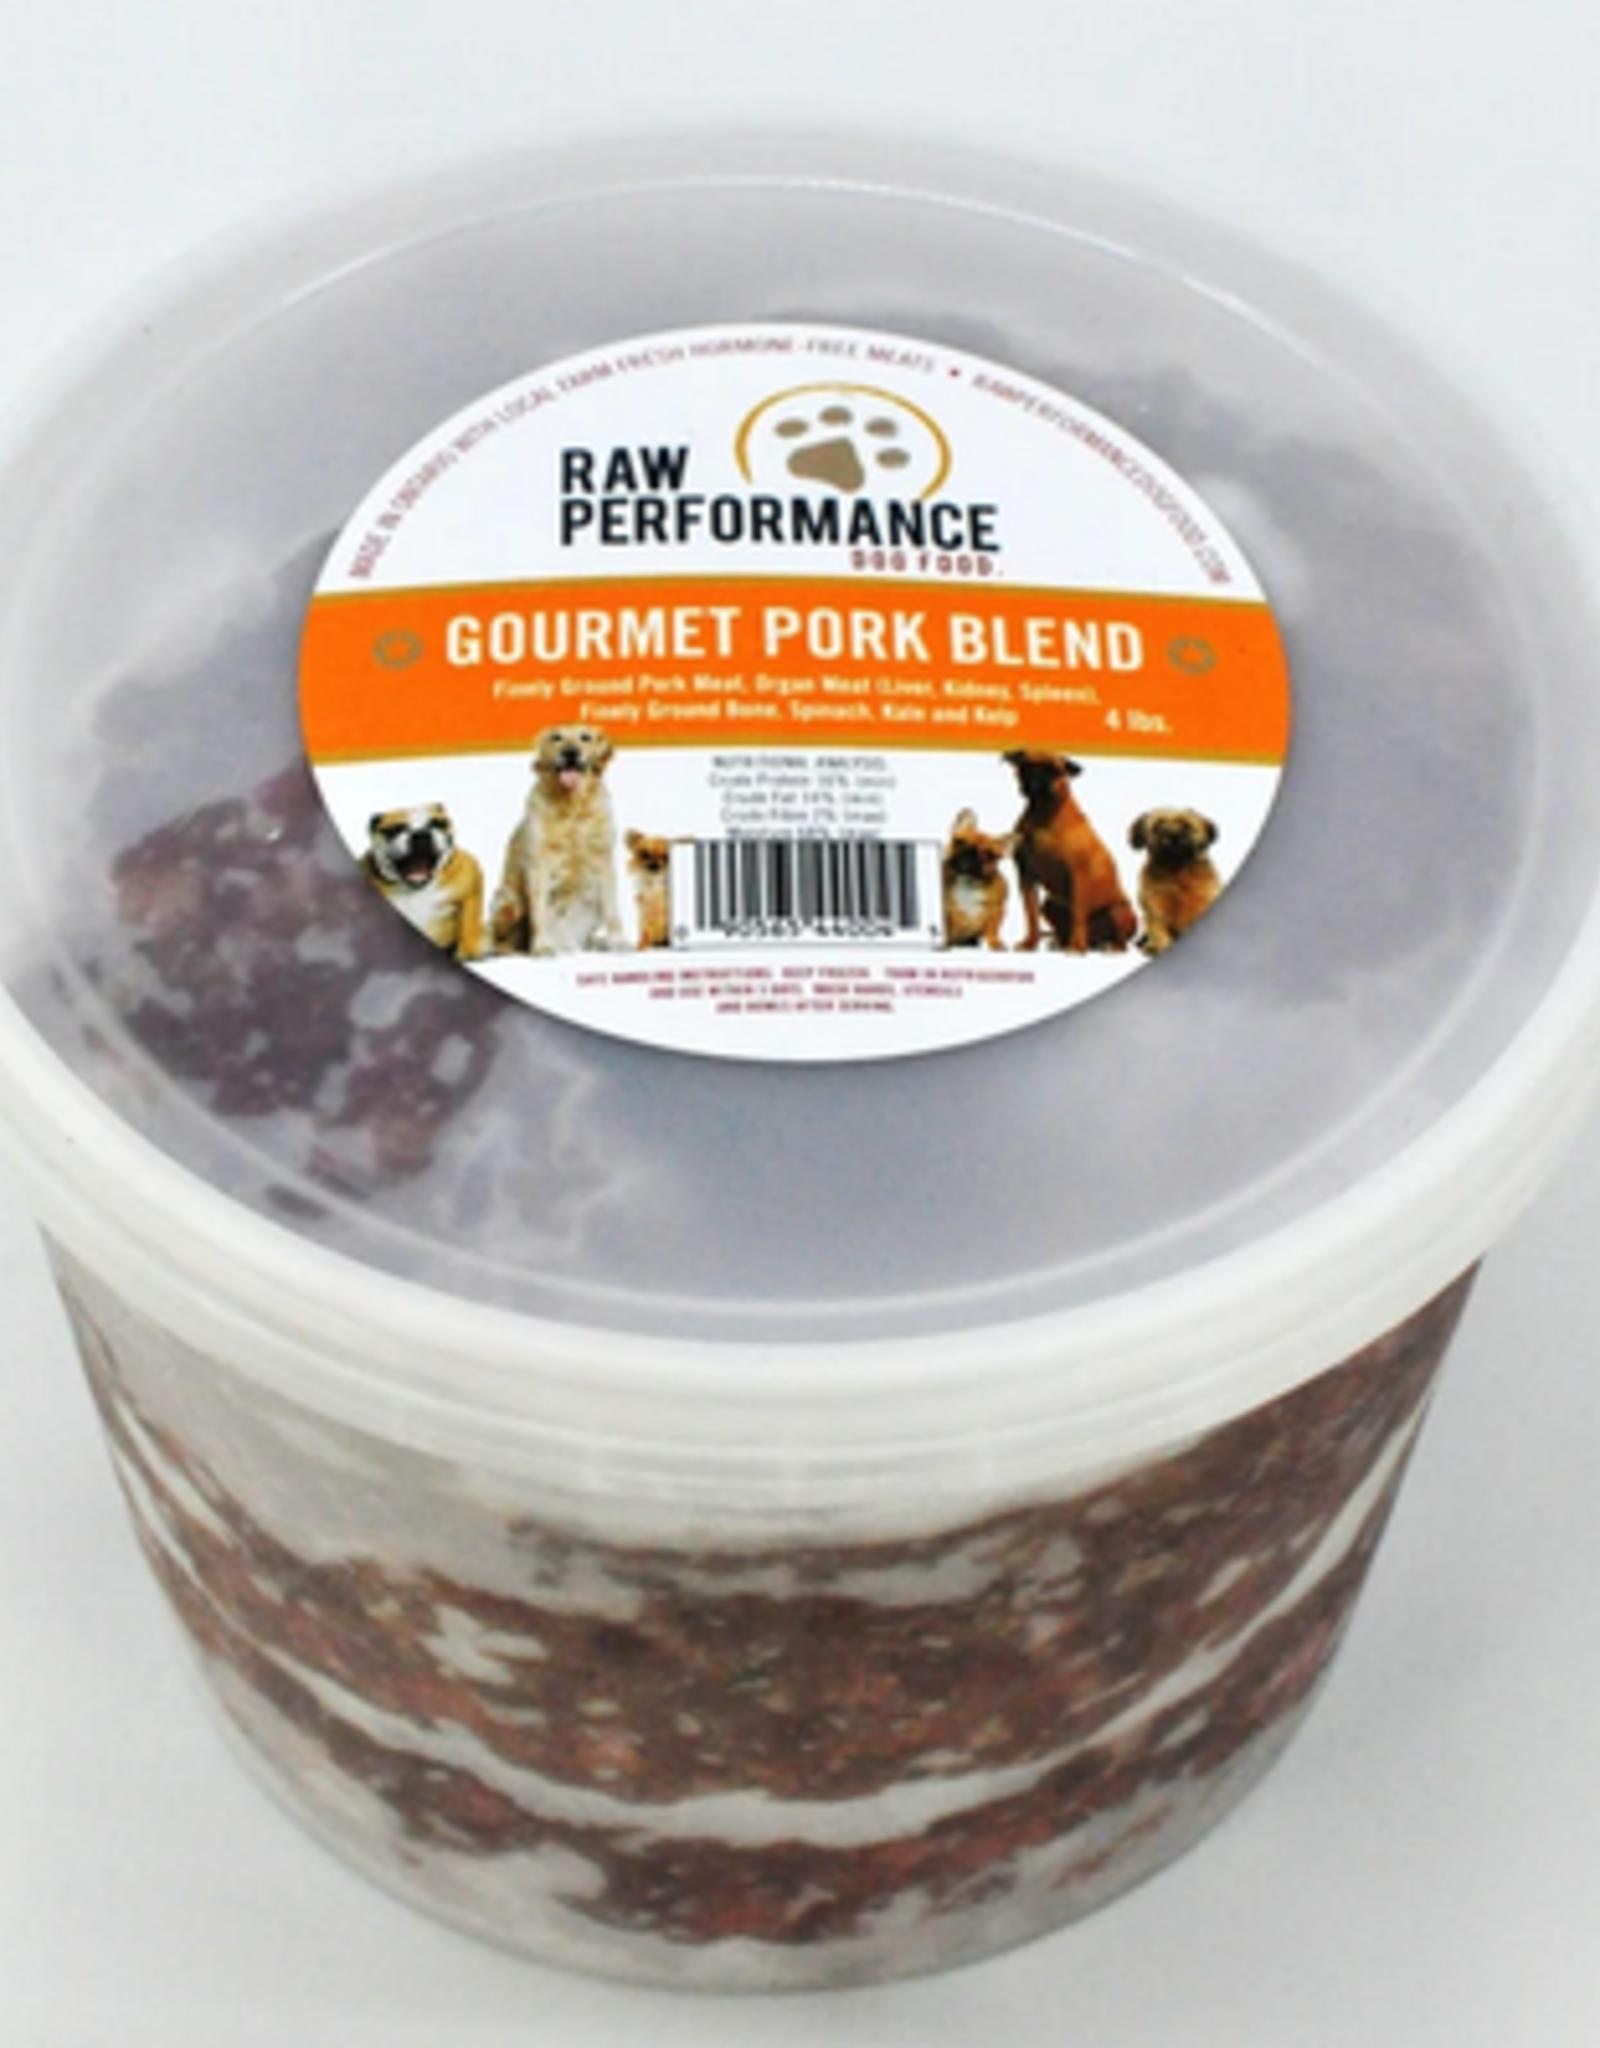 Raw Performance Raw Performance - Gourmet Pork Blend 4lb